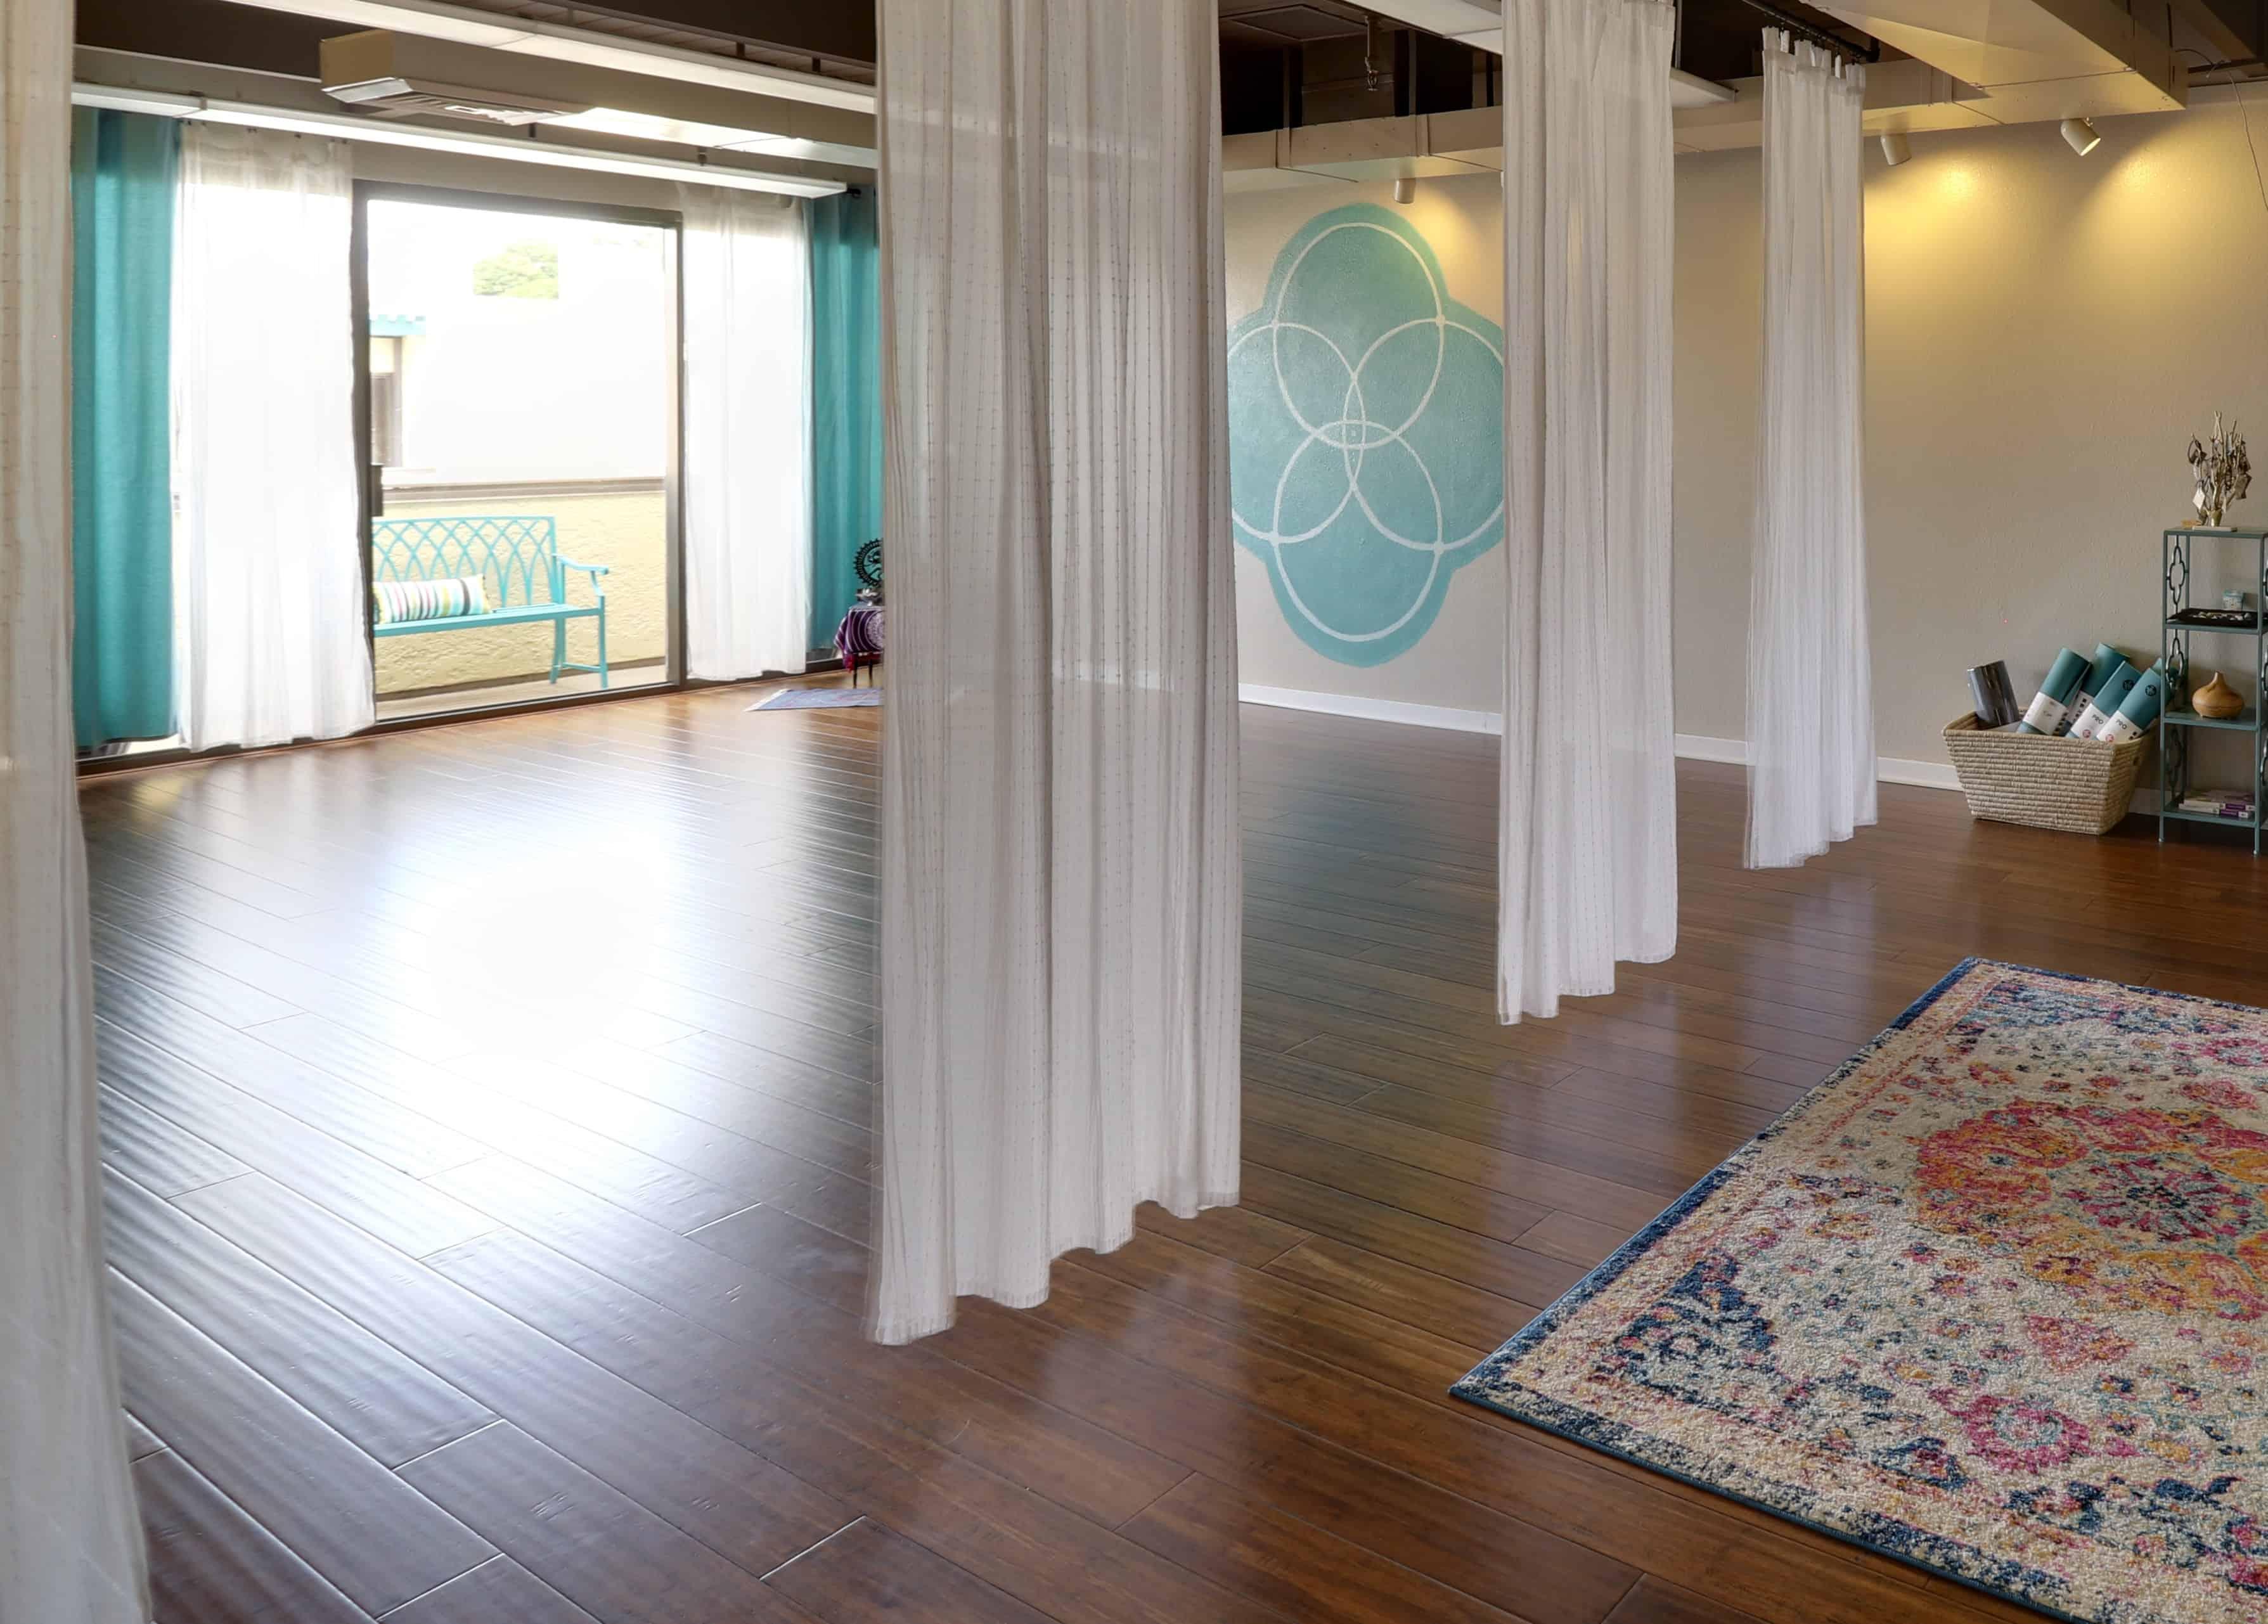 808 Wellness Studio Space